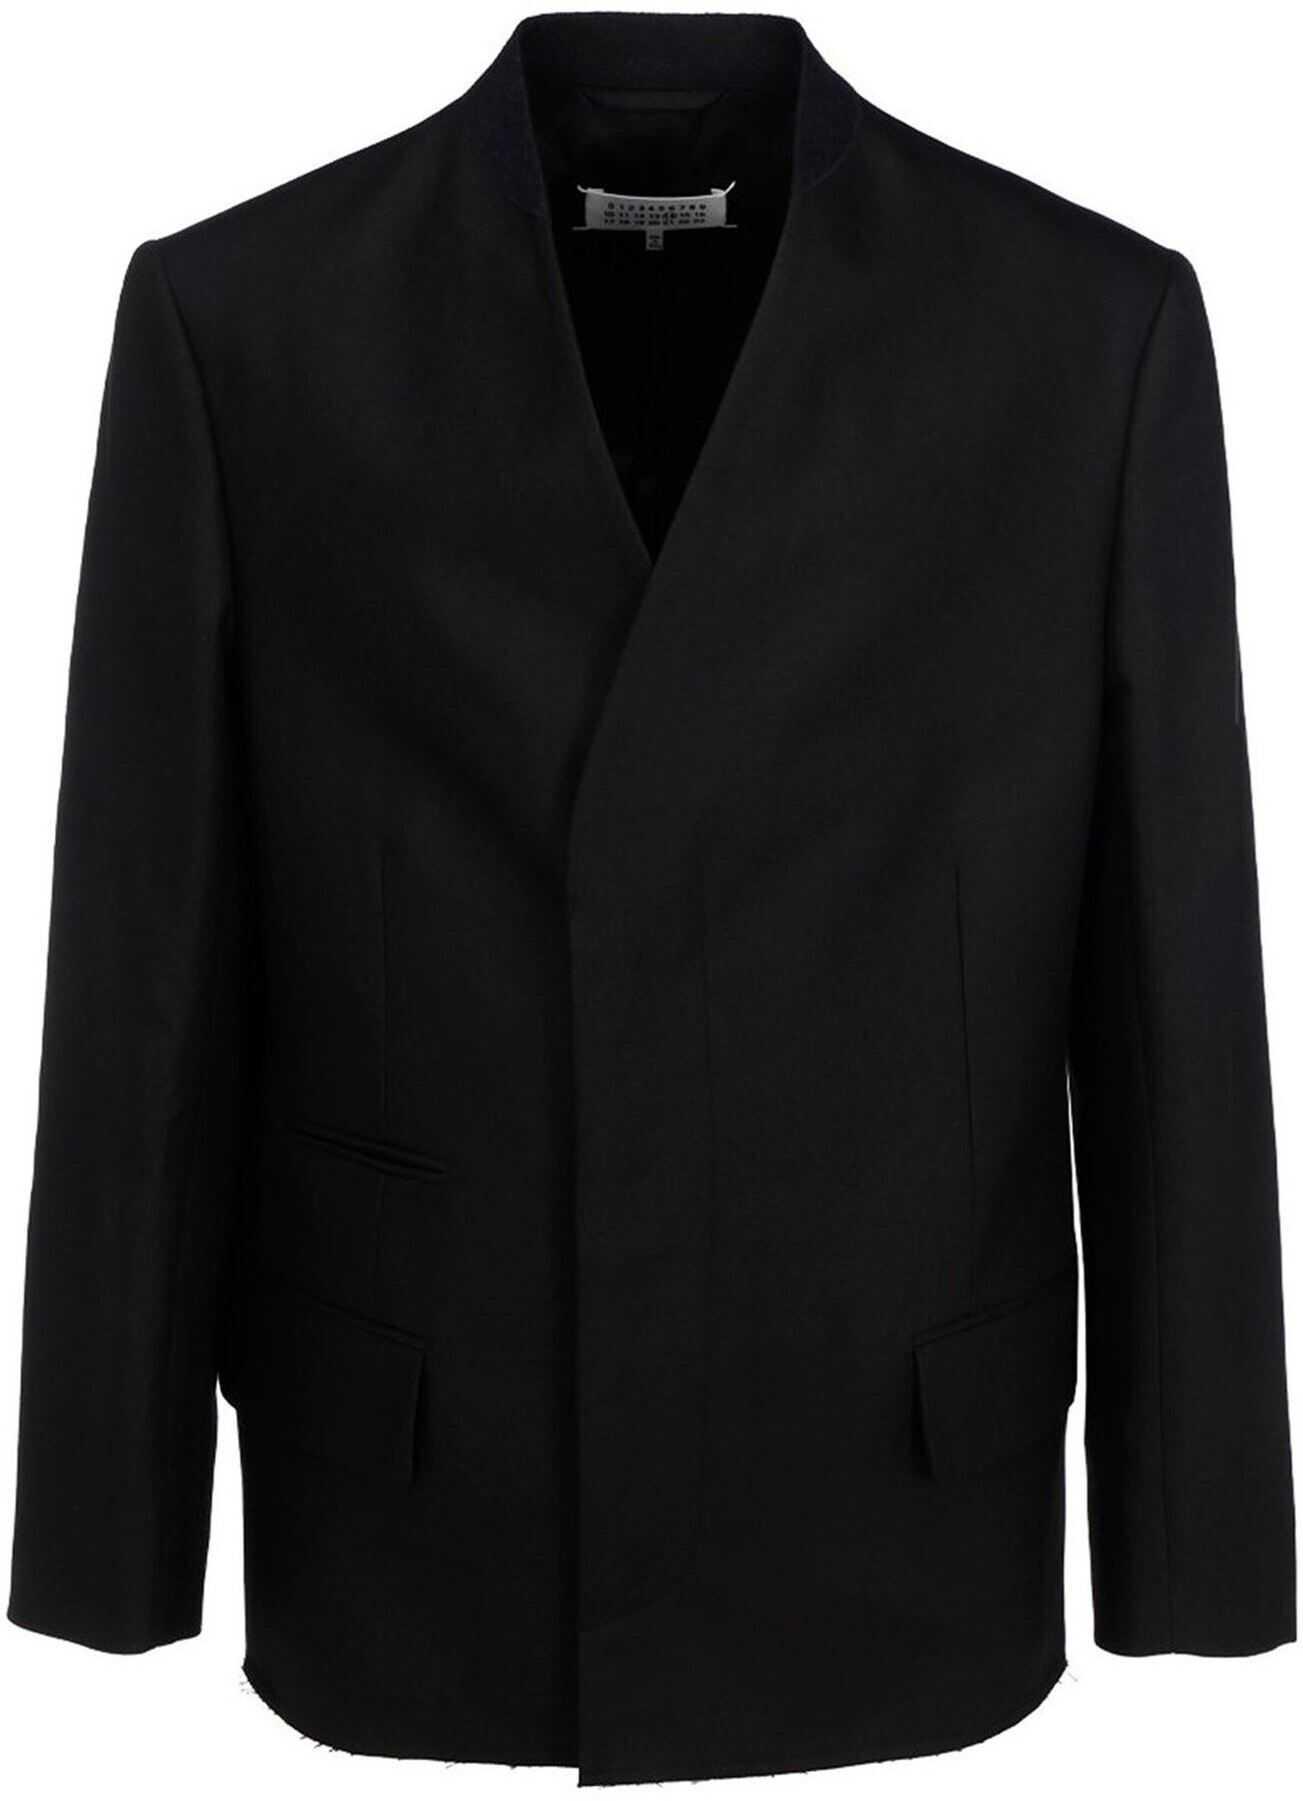 Maison Margiela Minimal Cotton Linen Blend Blazer In Black Black imagine